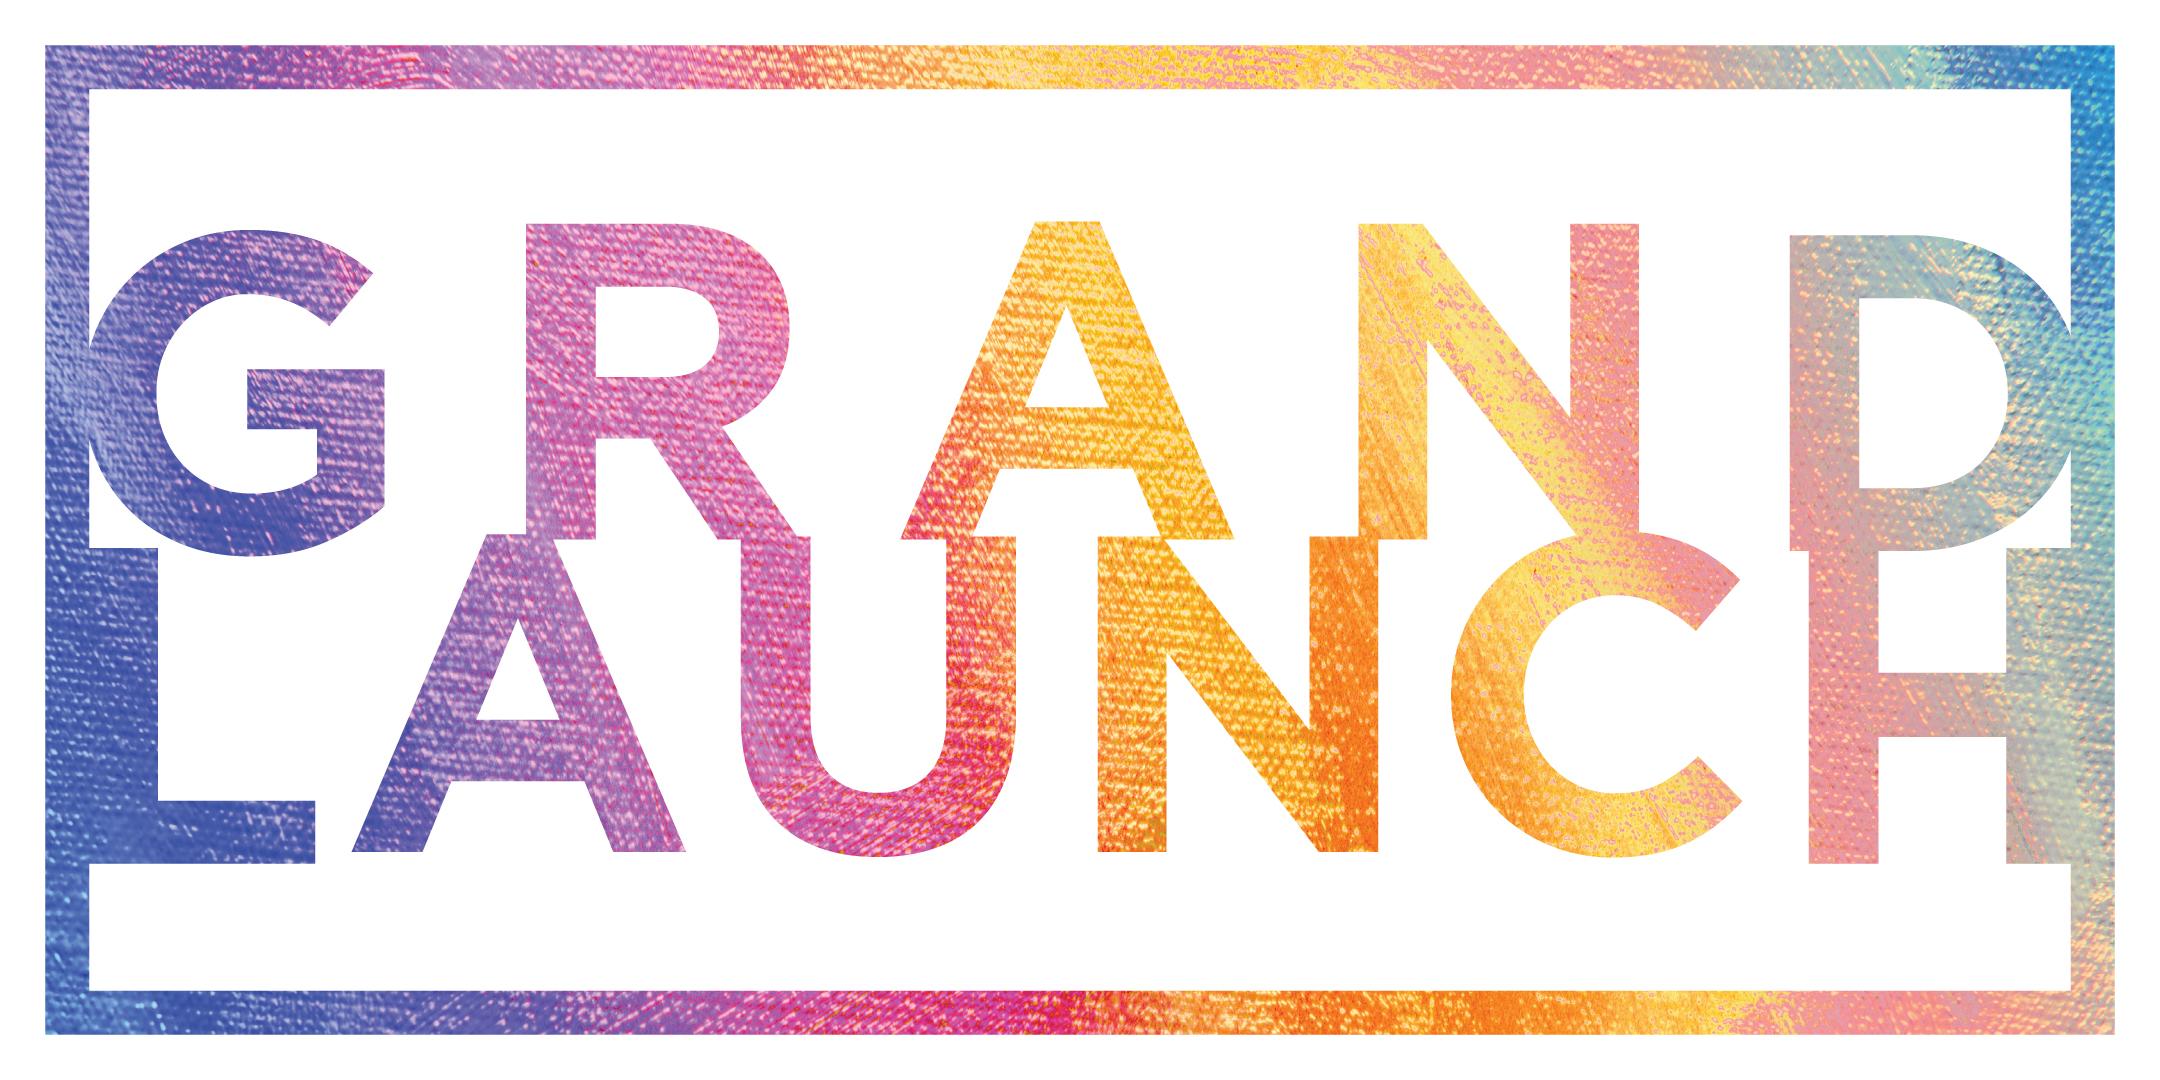 Grand-Launch-2160x1080px.jpg